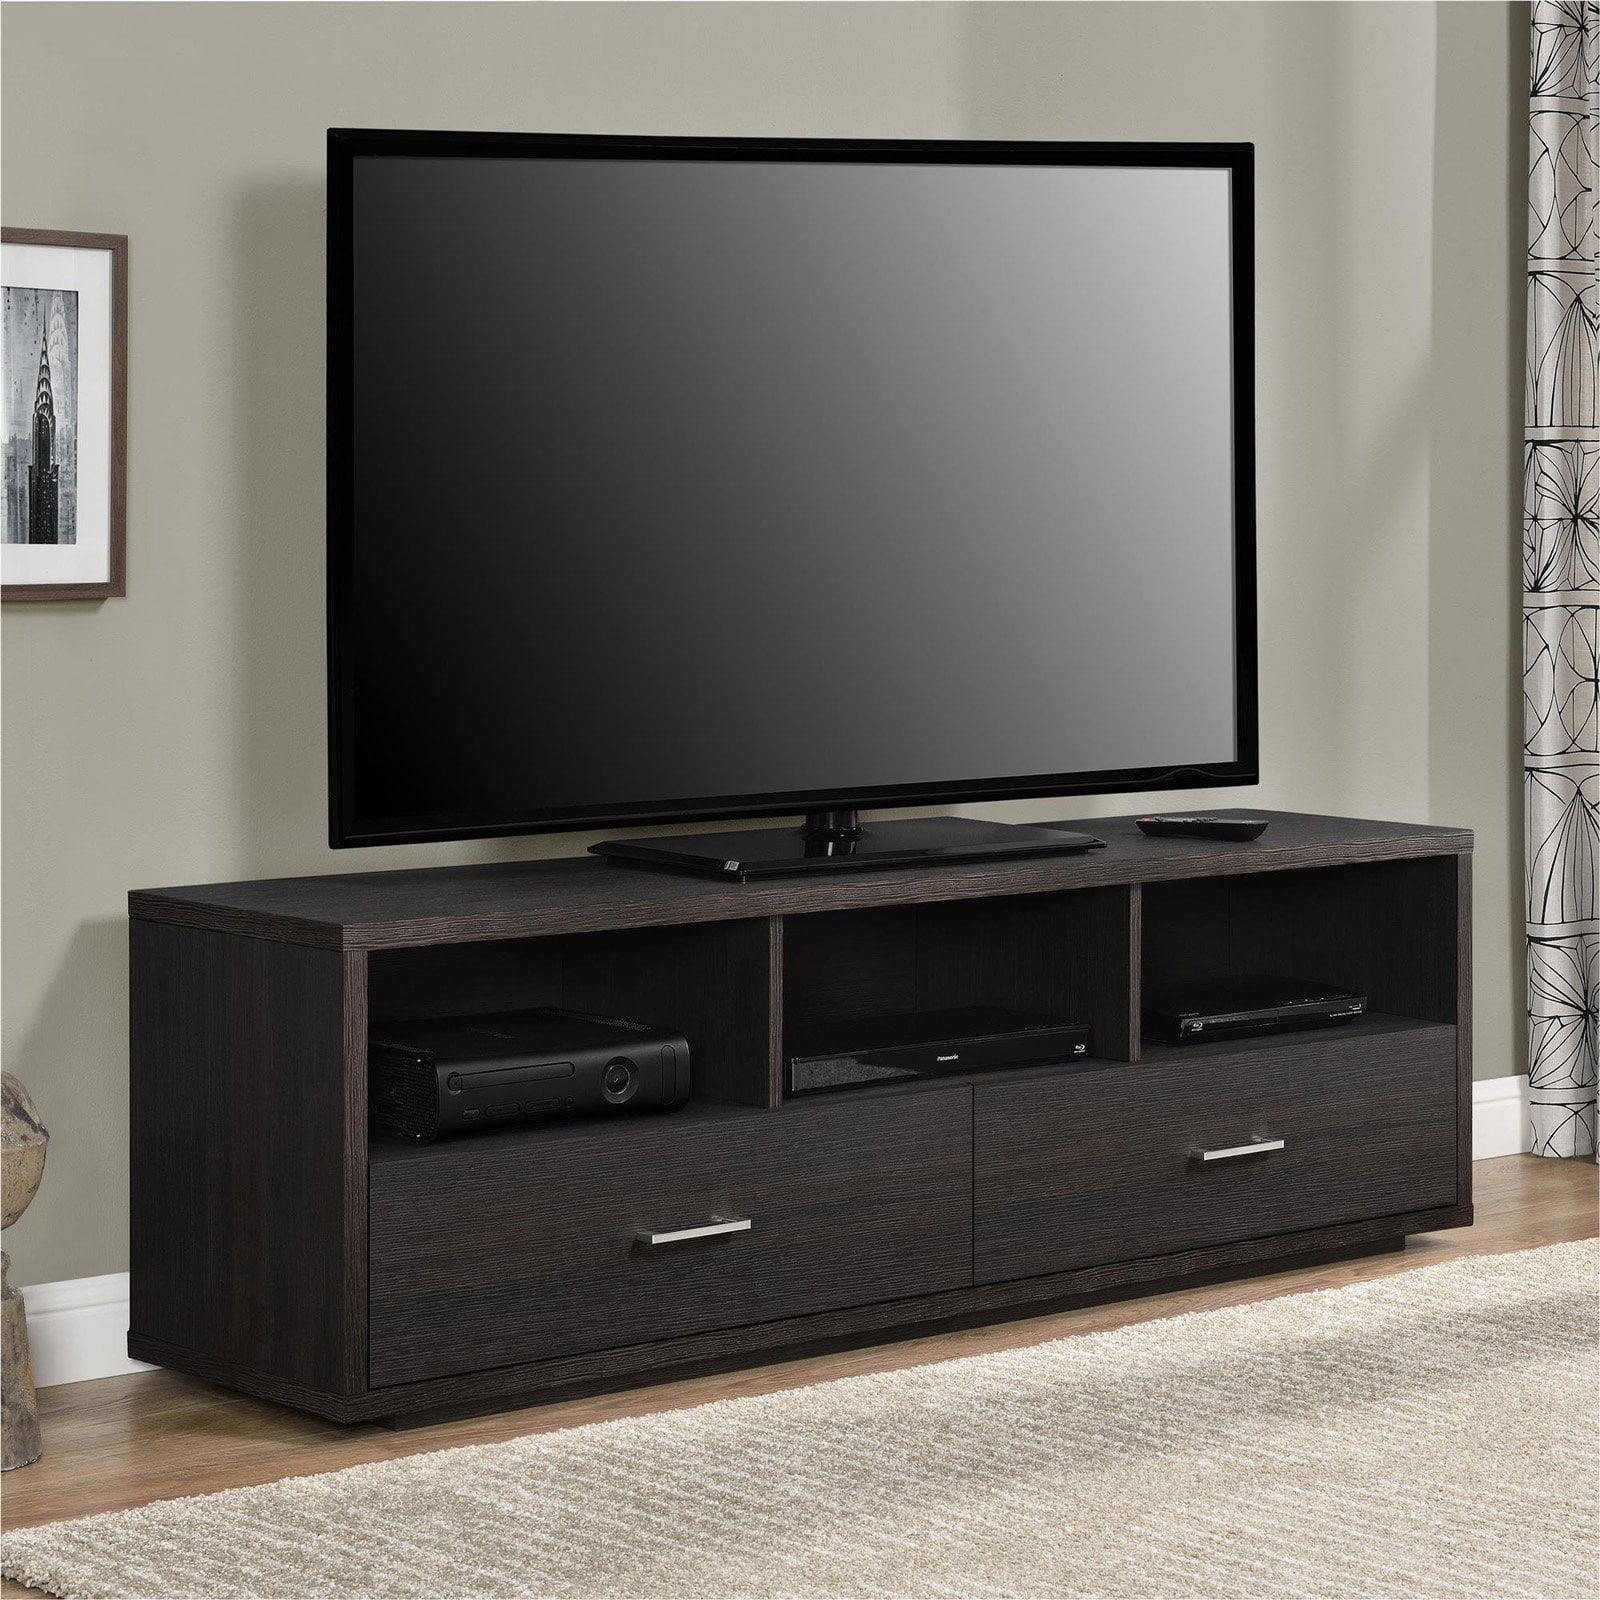 Ameriwood Home Clark Tv Stand For Tvs Up To 70 Espresso Walmartcom